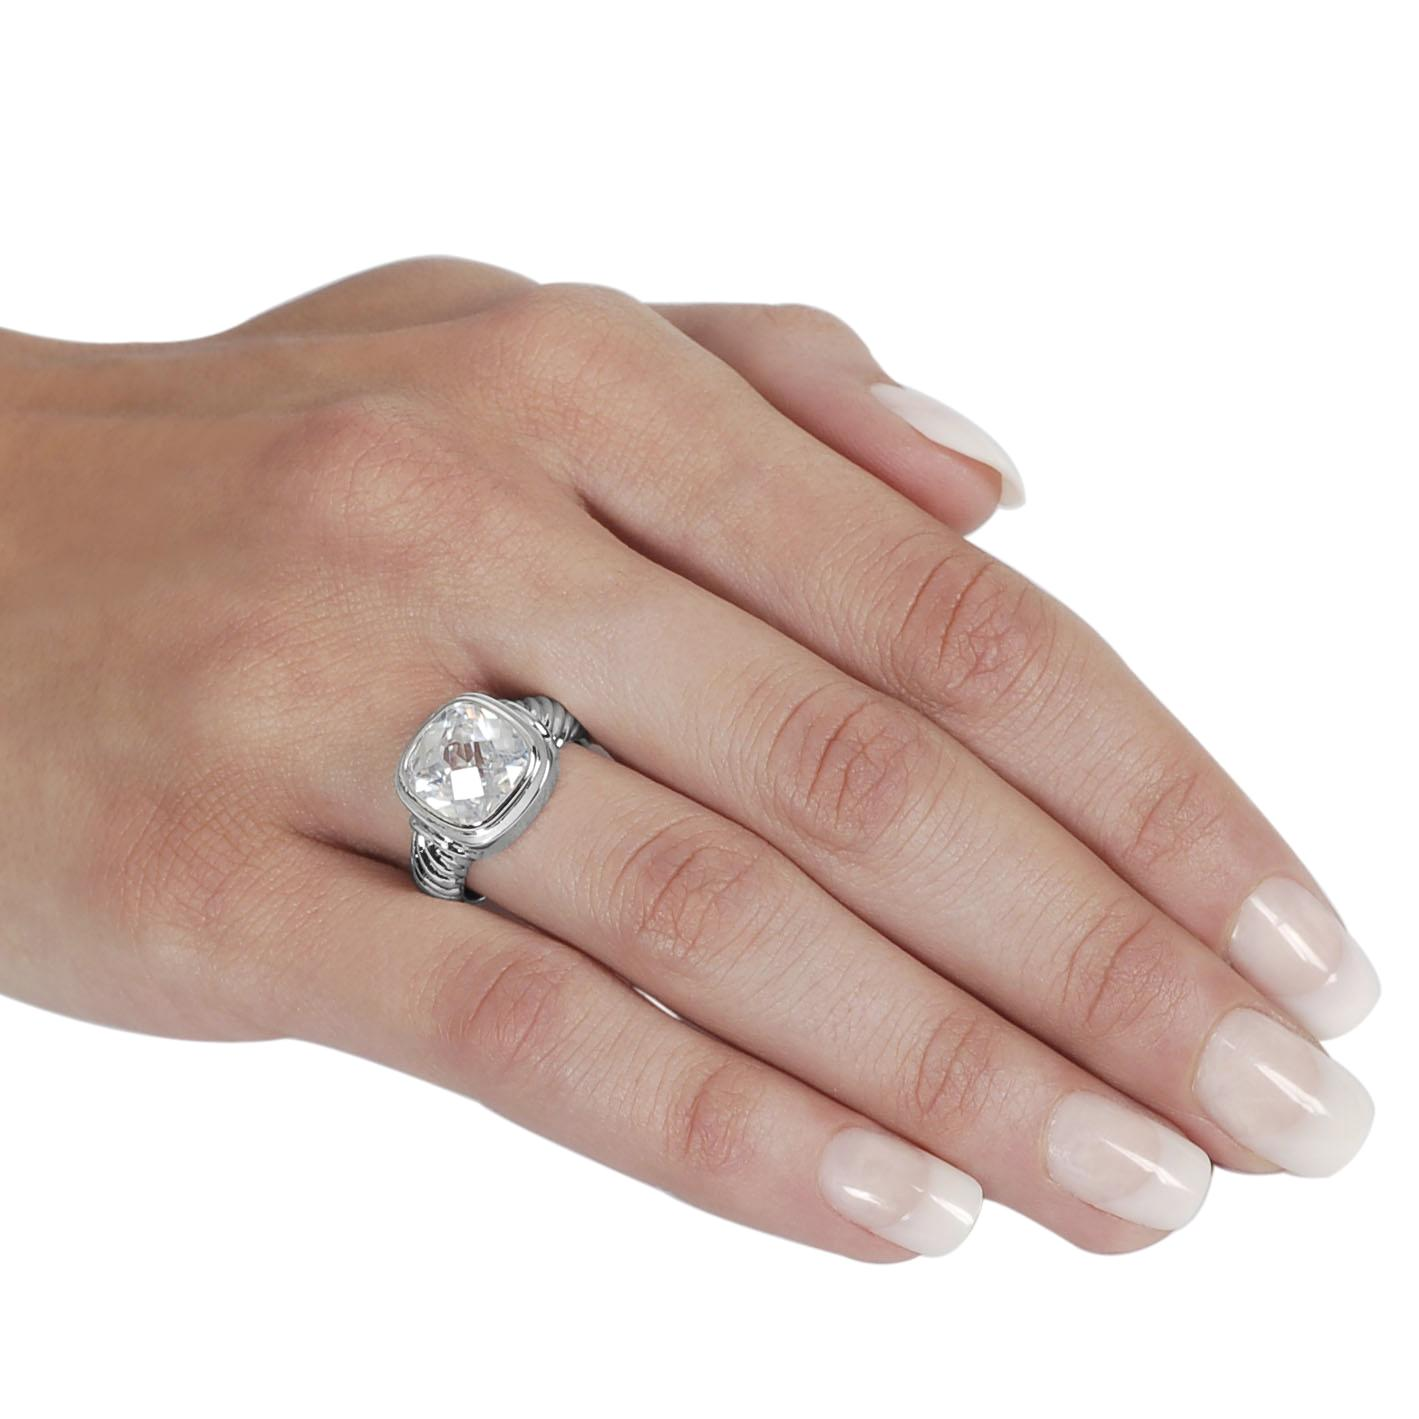 Journee Collection Silvertone Cushion-cut CZ Twist Ring